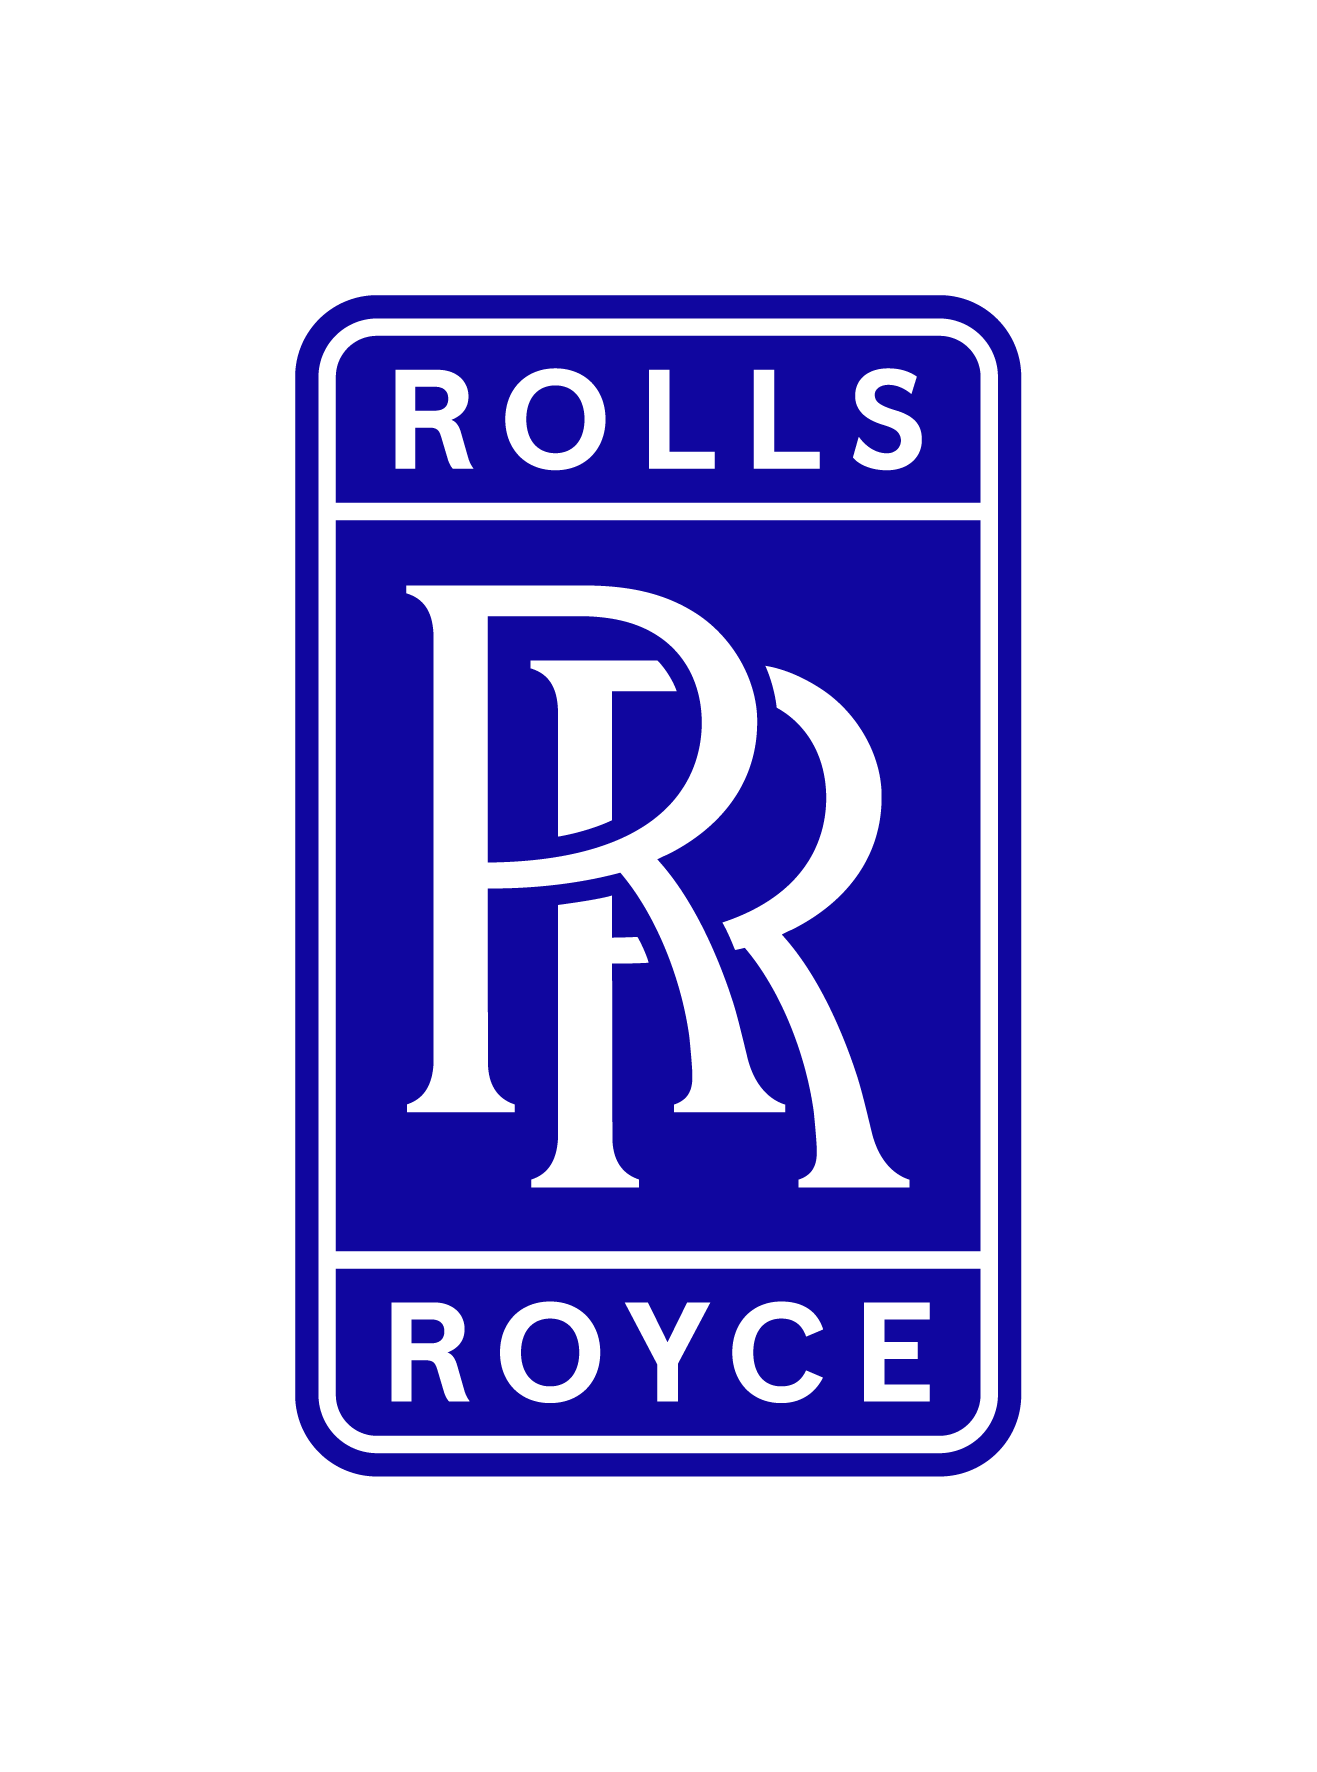 rollsRoyce logo image